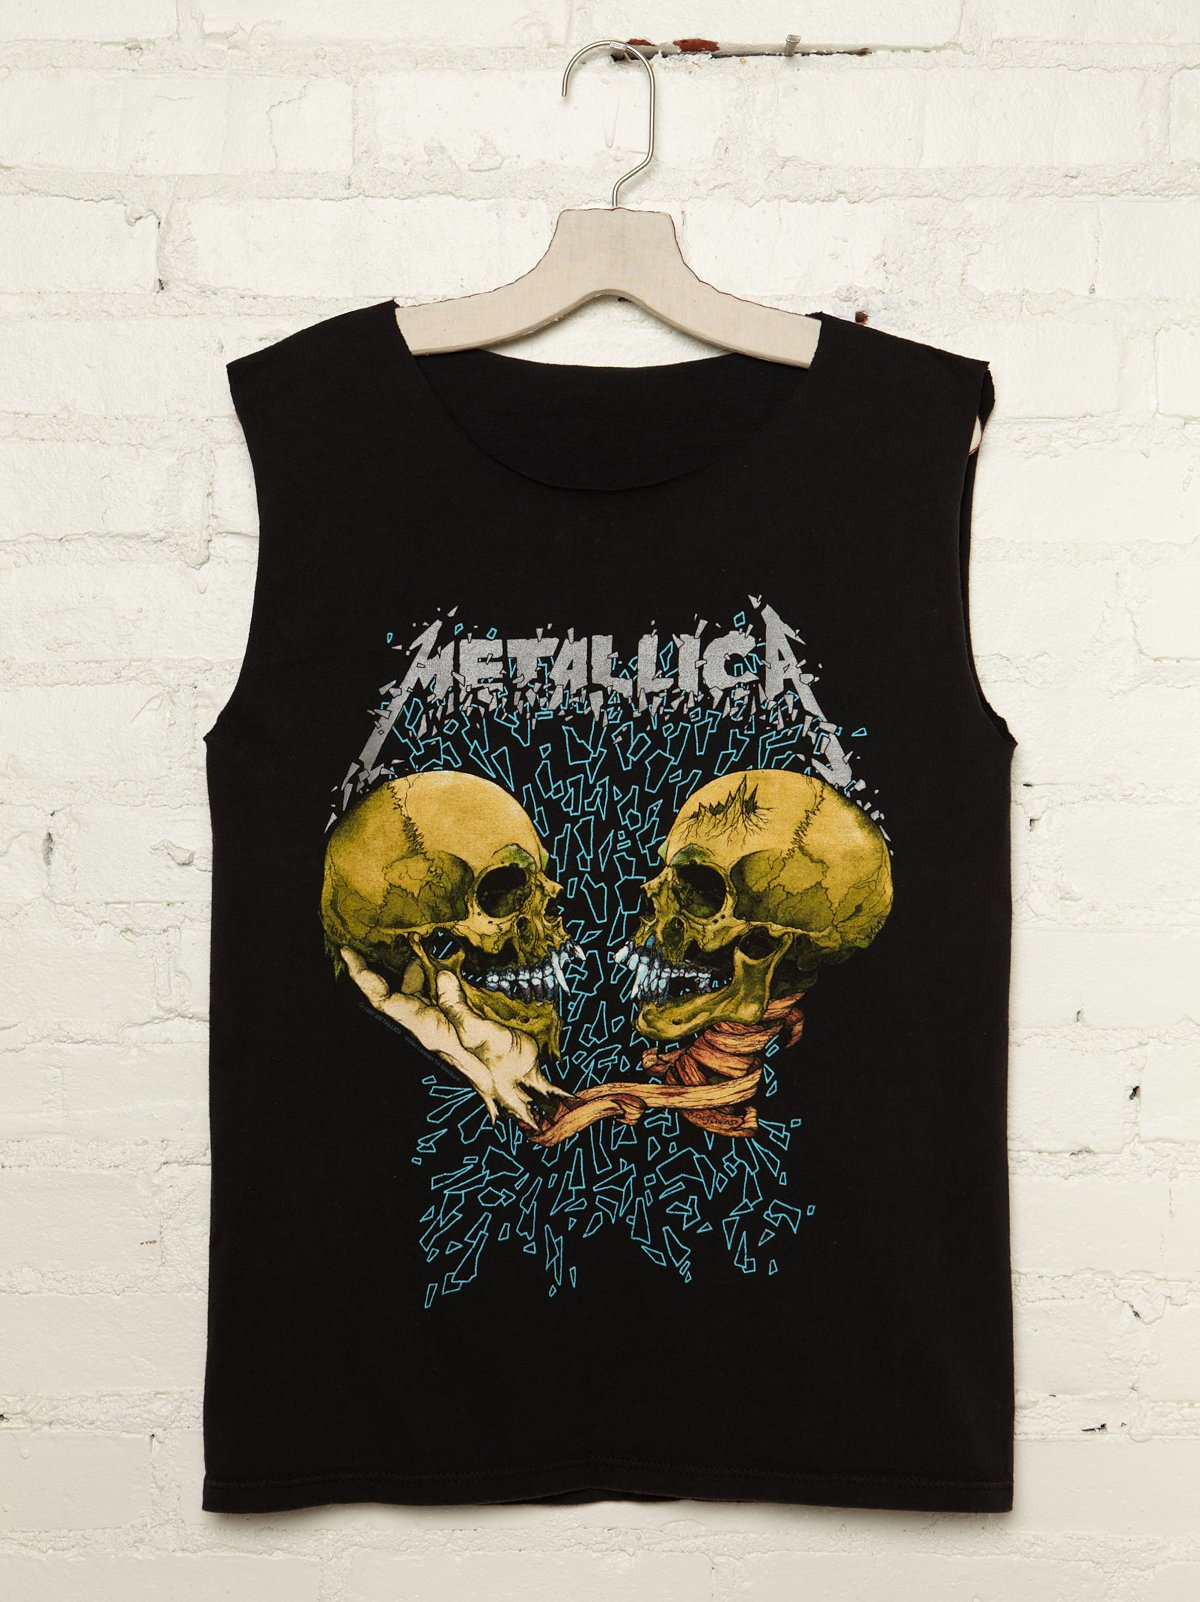 Vintage Metallica Tank